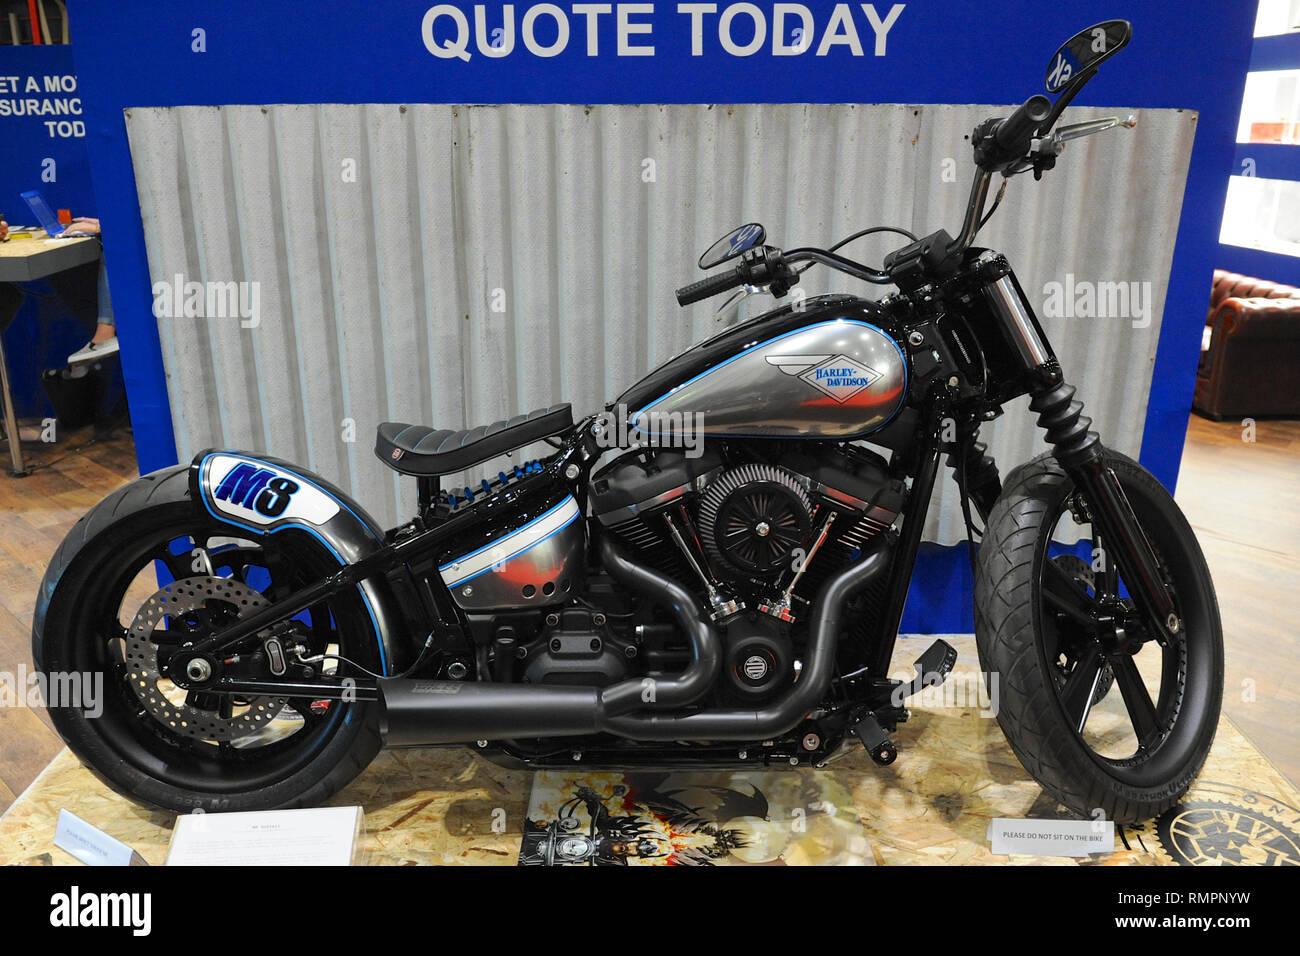 London, UK  15th Feb, 2019  A customised Harley-Davidson